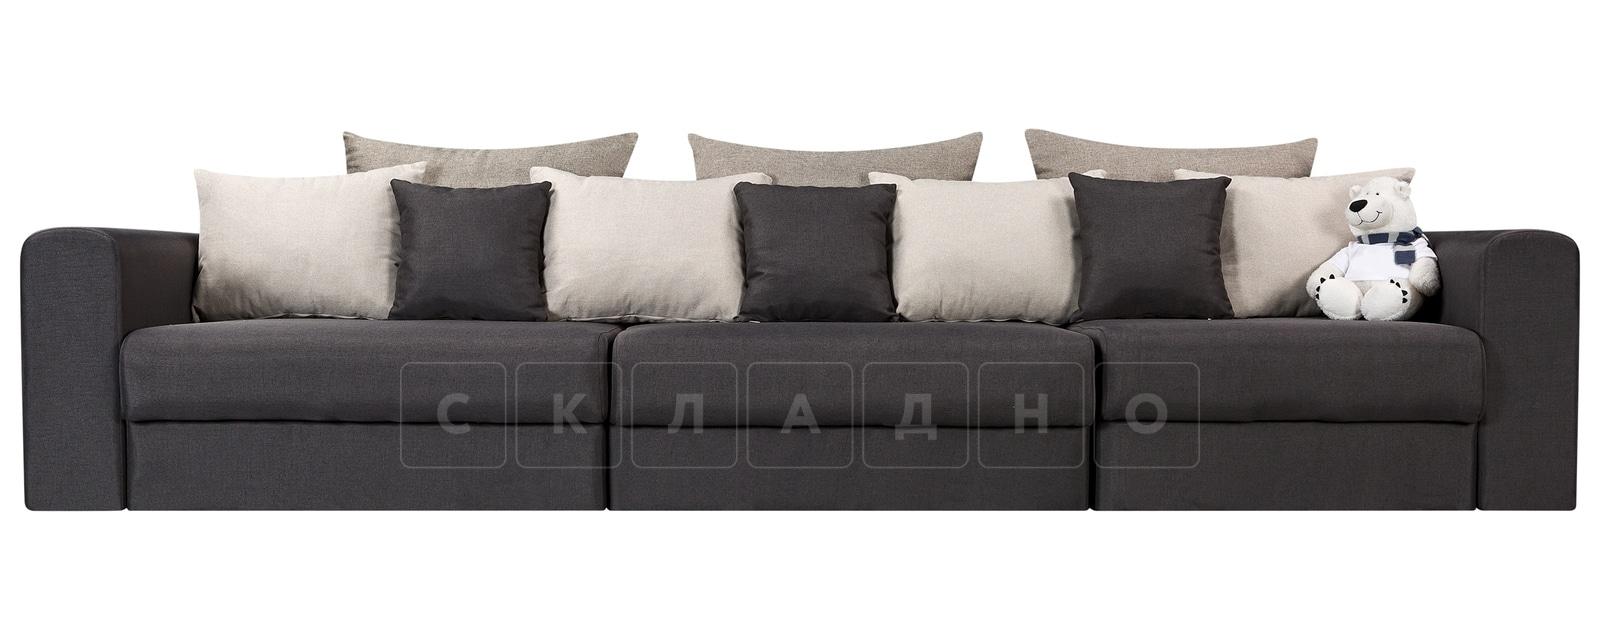 Диван Медисон темно-серый 325 см фото 2 | интернет-магазин Складно